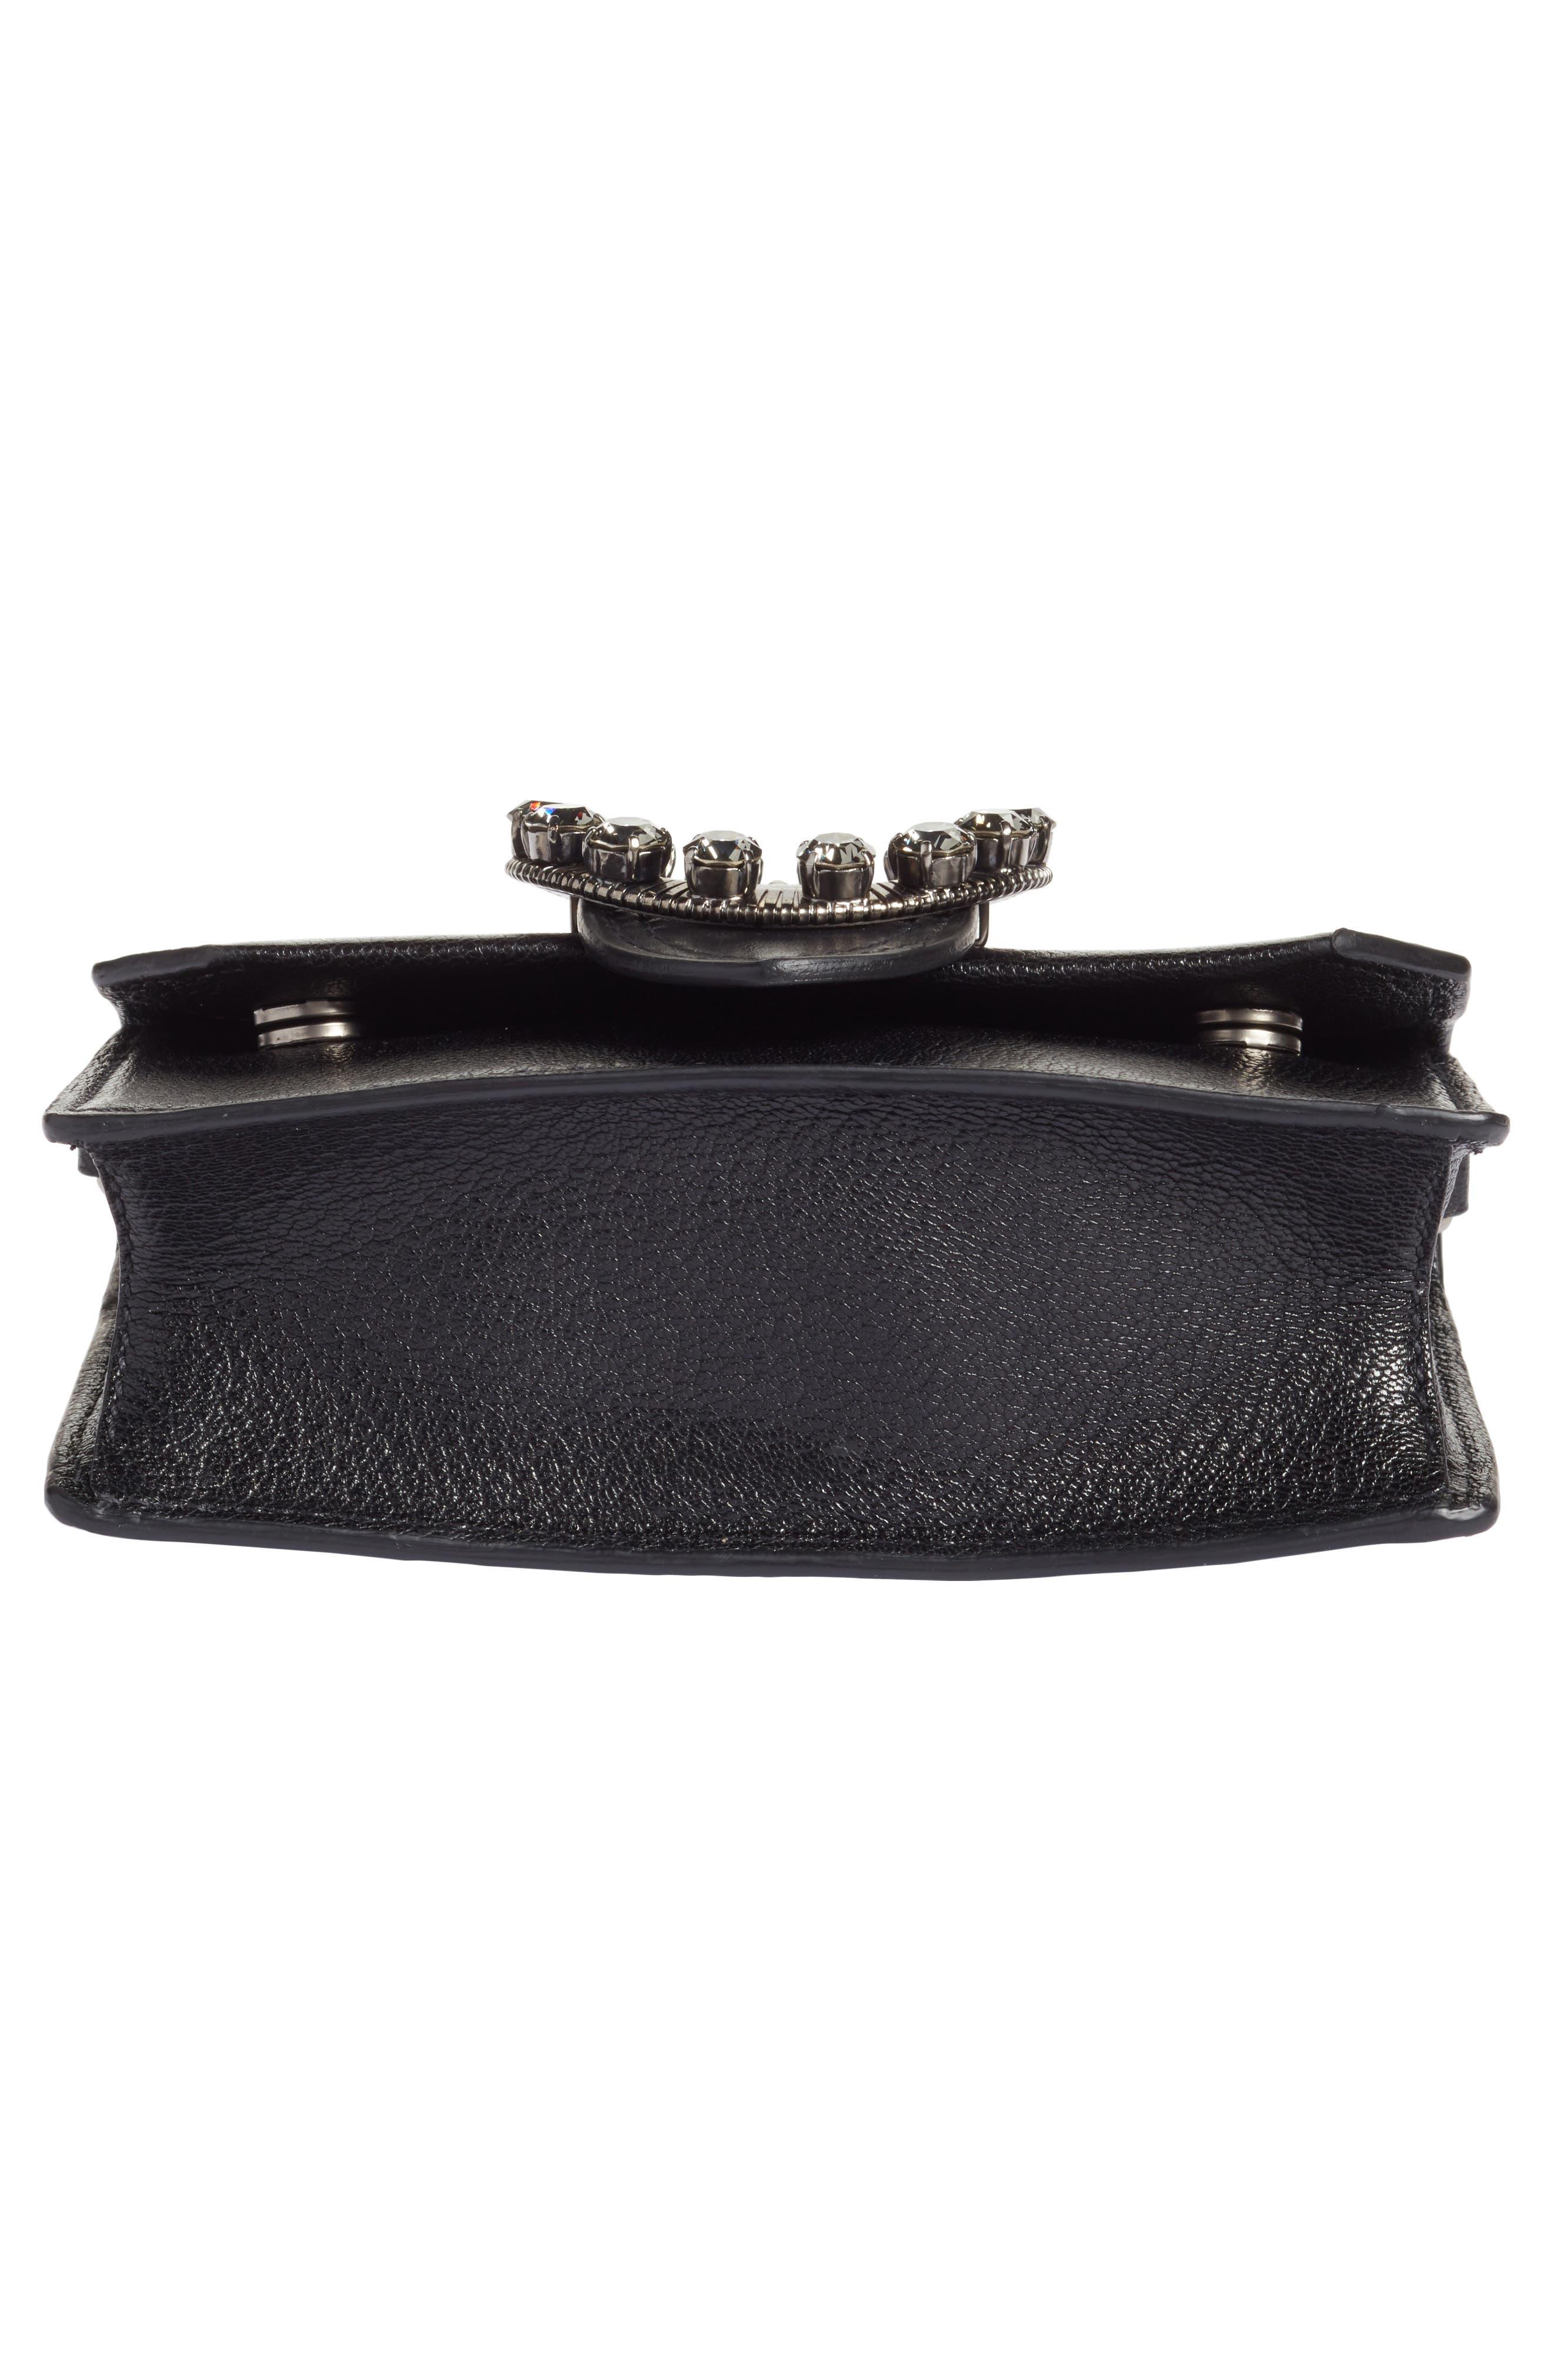 Lady Madras Crystal Embellished Leather Crossbody Bag,                             Alternate thumbnail 6, color,                             Nero 1